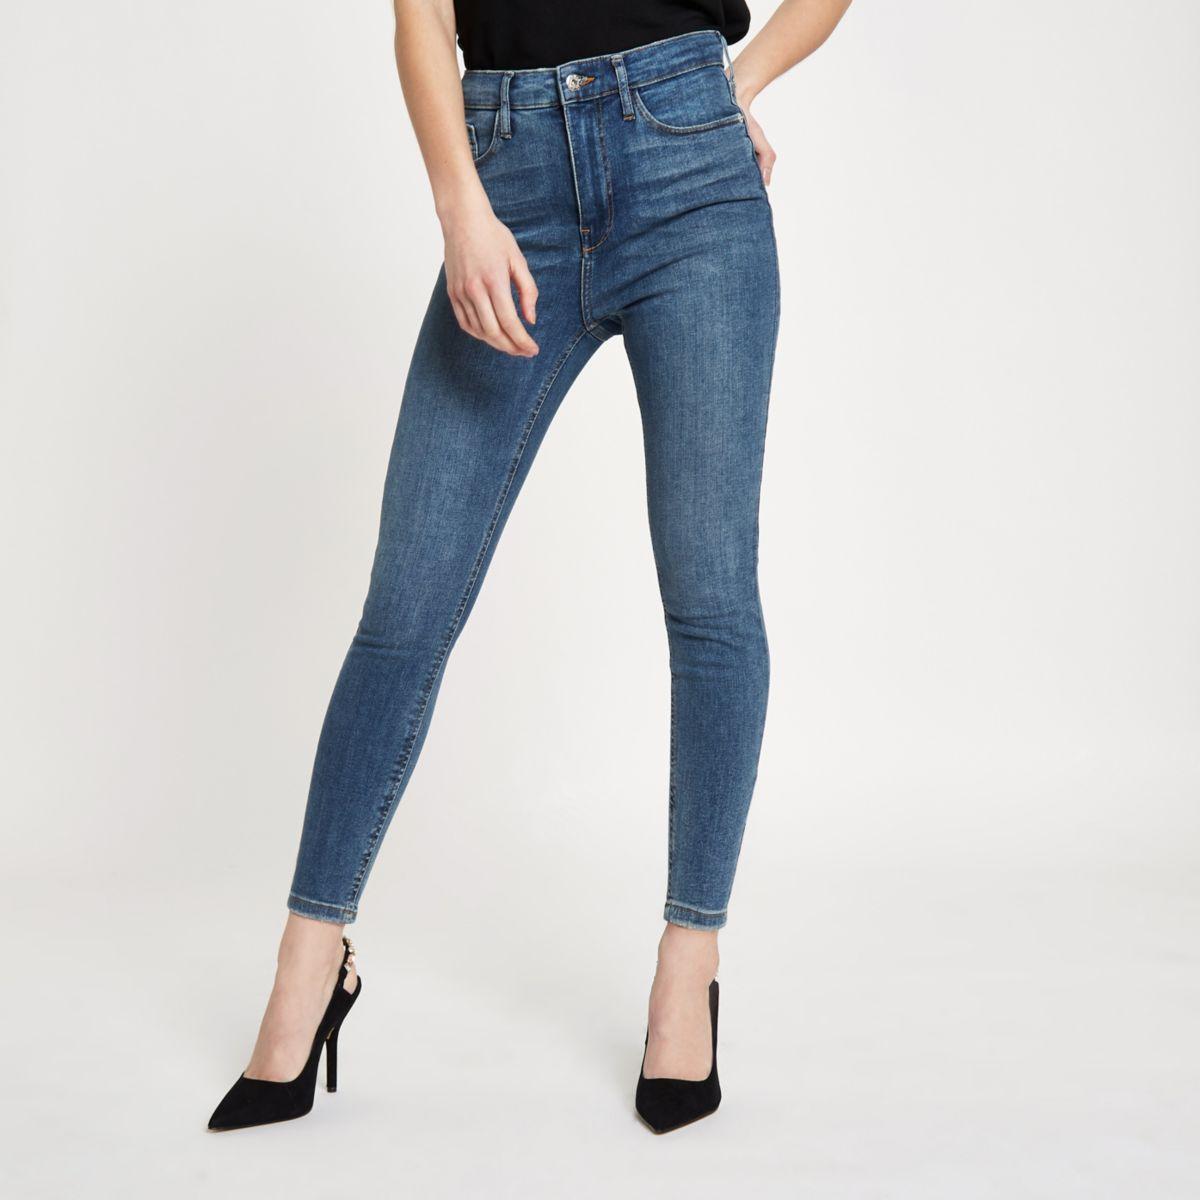 64522575a7fa Petite – Harper – Jean skinny bleu mi-délavé taille haute - Jeans ...